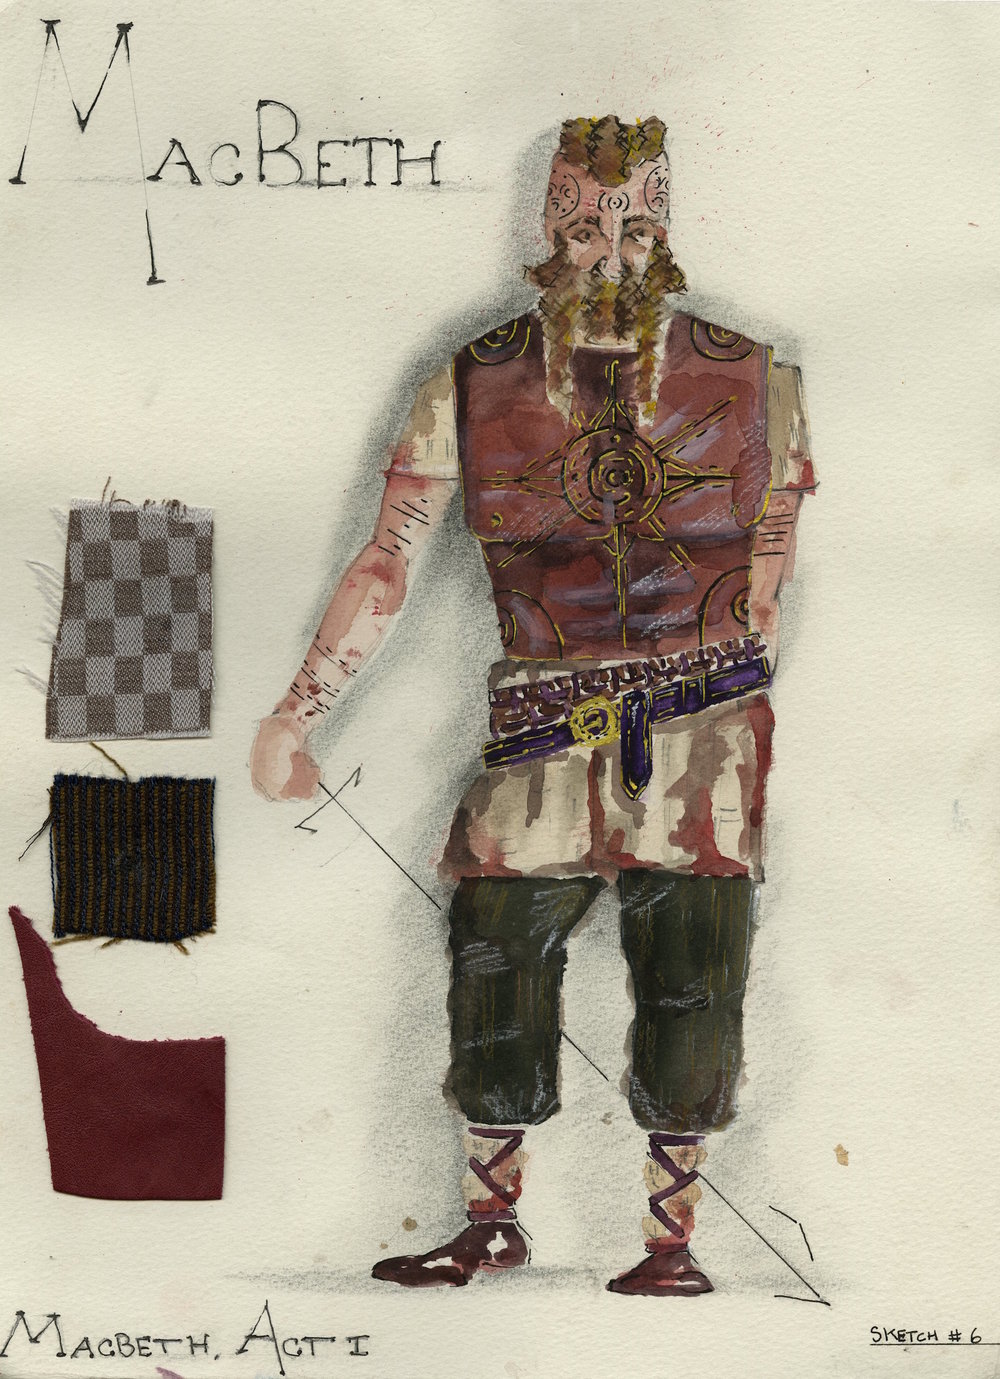 Macbeth A1.jpg